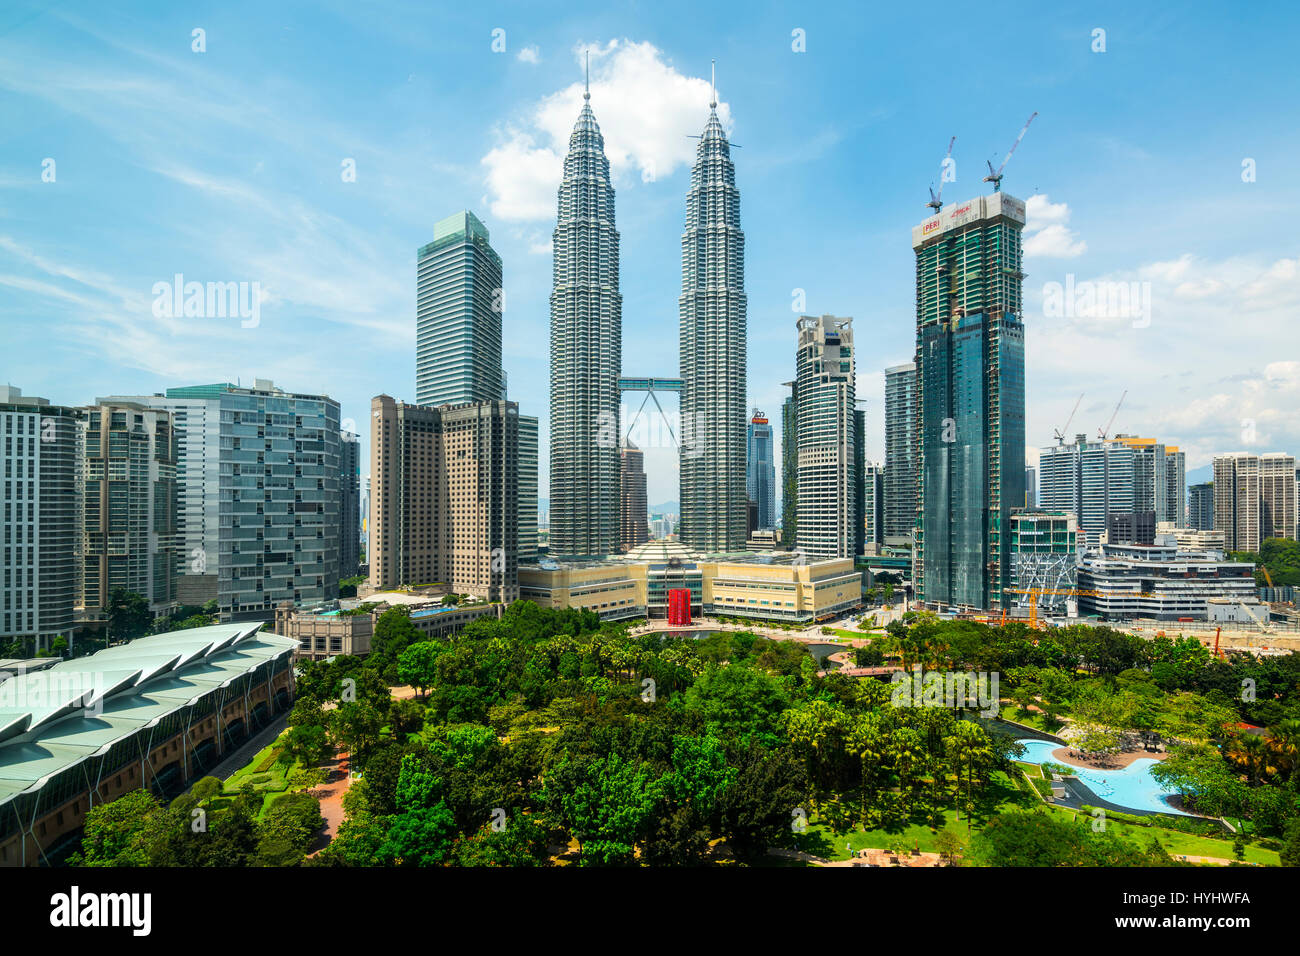 Petronas Twin Towers and Central Kuala Lumpur Skyline across KLCC Park, Malaysia - Stock Image